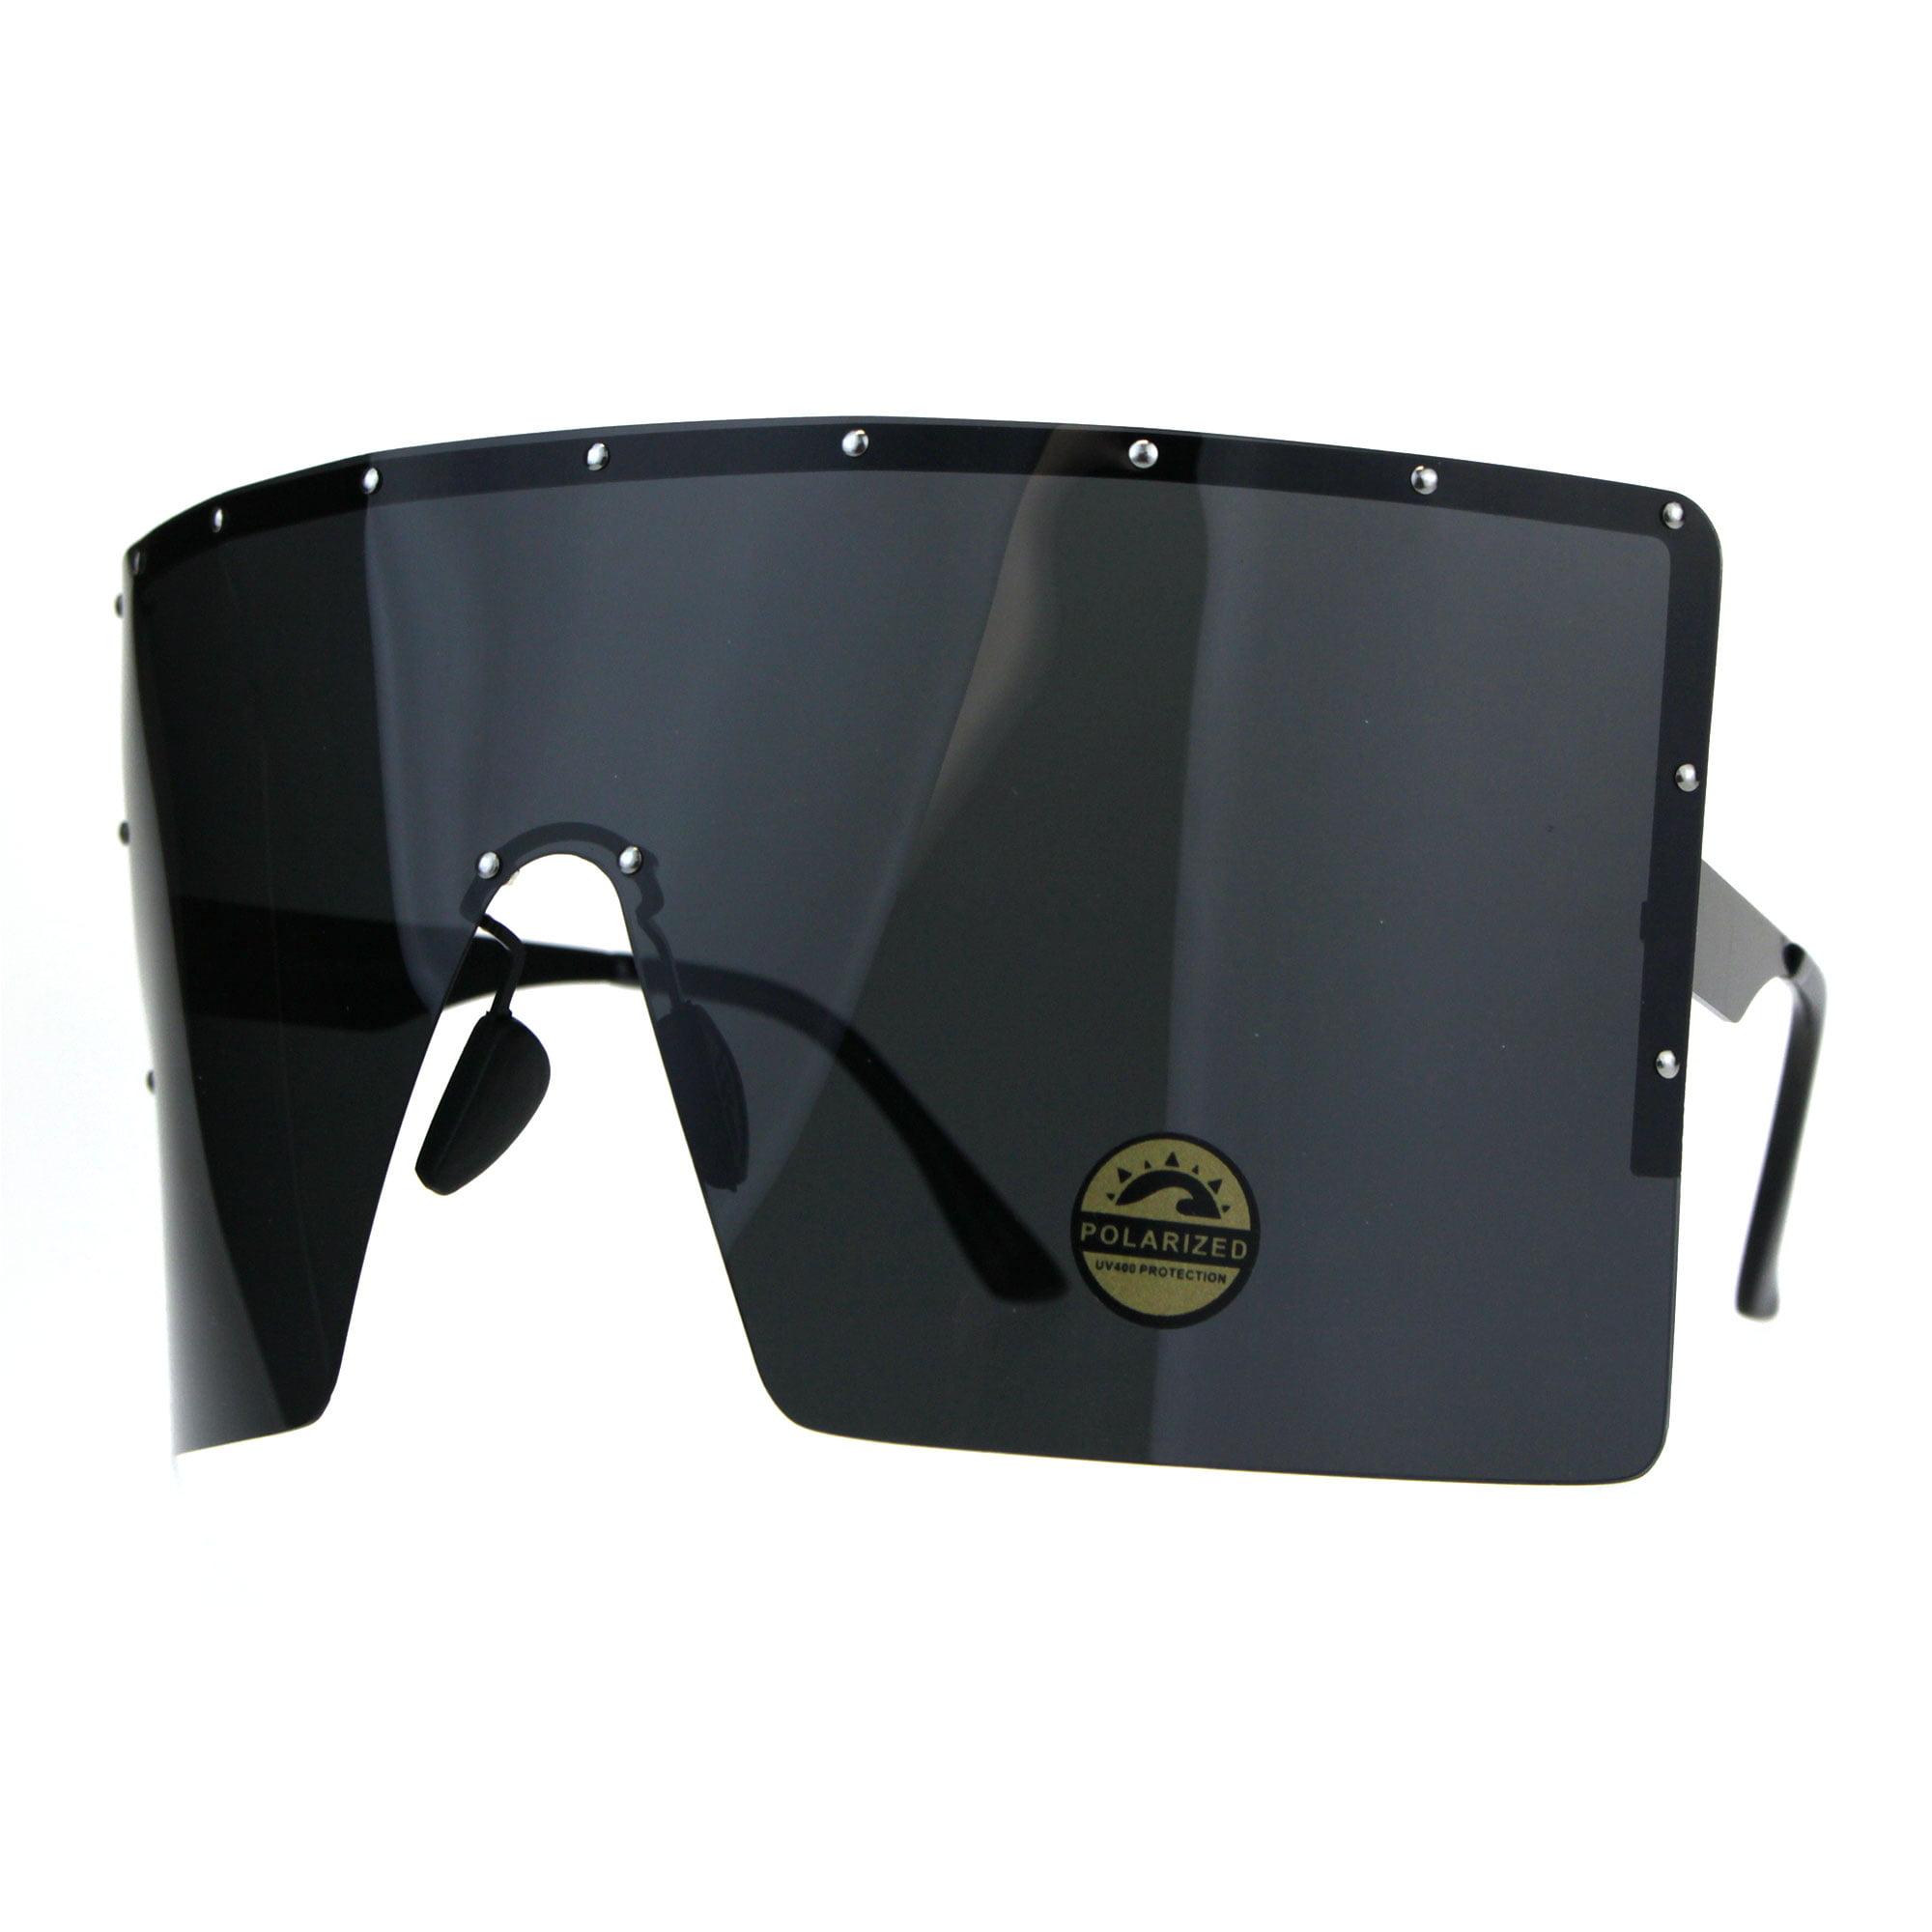 Sa106 Polarized Extra Large Face Mask Futuristic Shield Sunglasses All Black Walmart Com Walmart Com